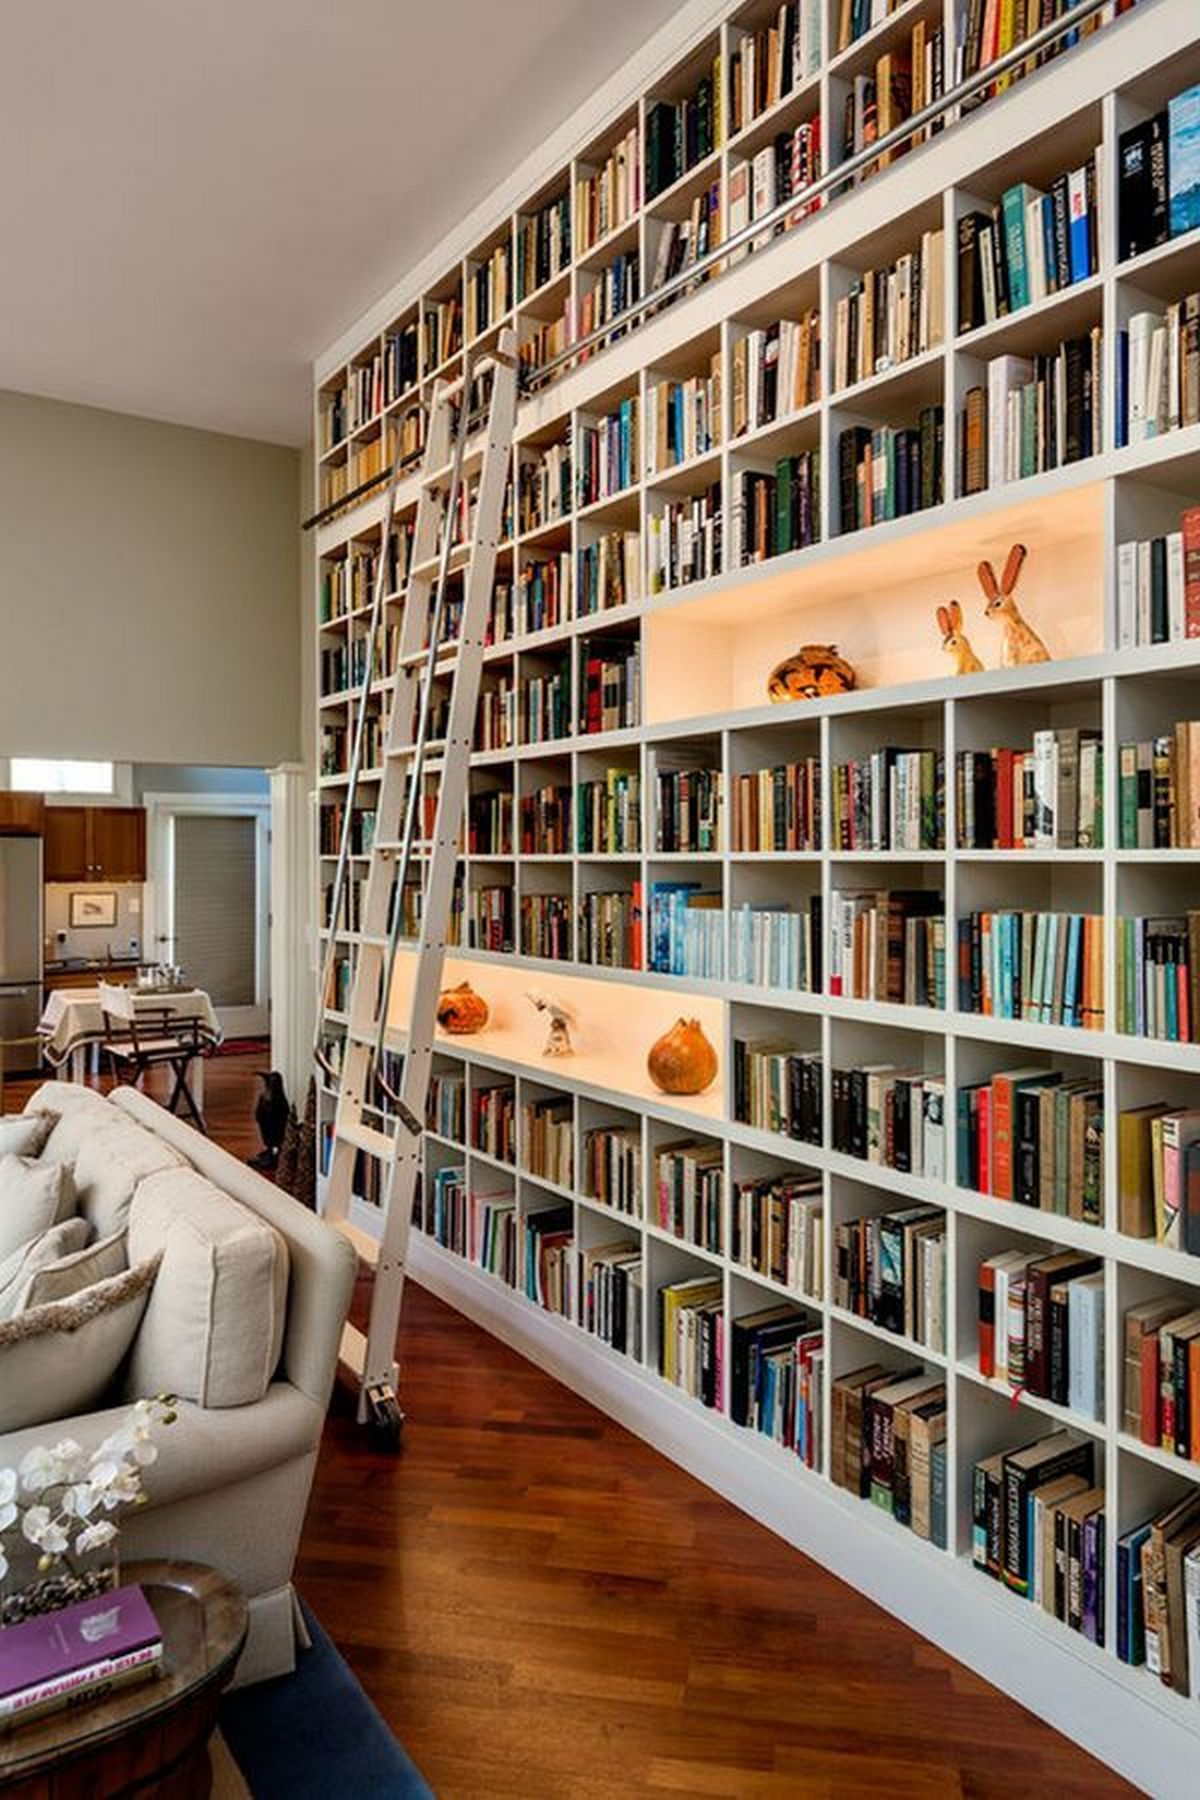 Cool 130 Bookshelf Ideas To Organize Your Book